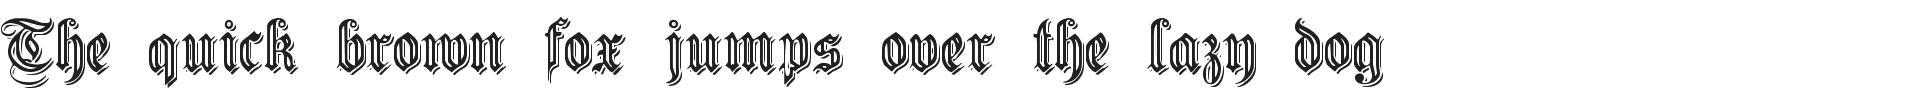 Free Germanic Font Embossed